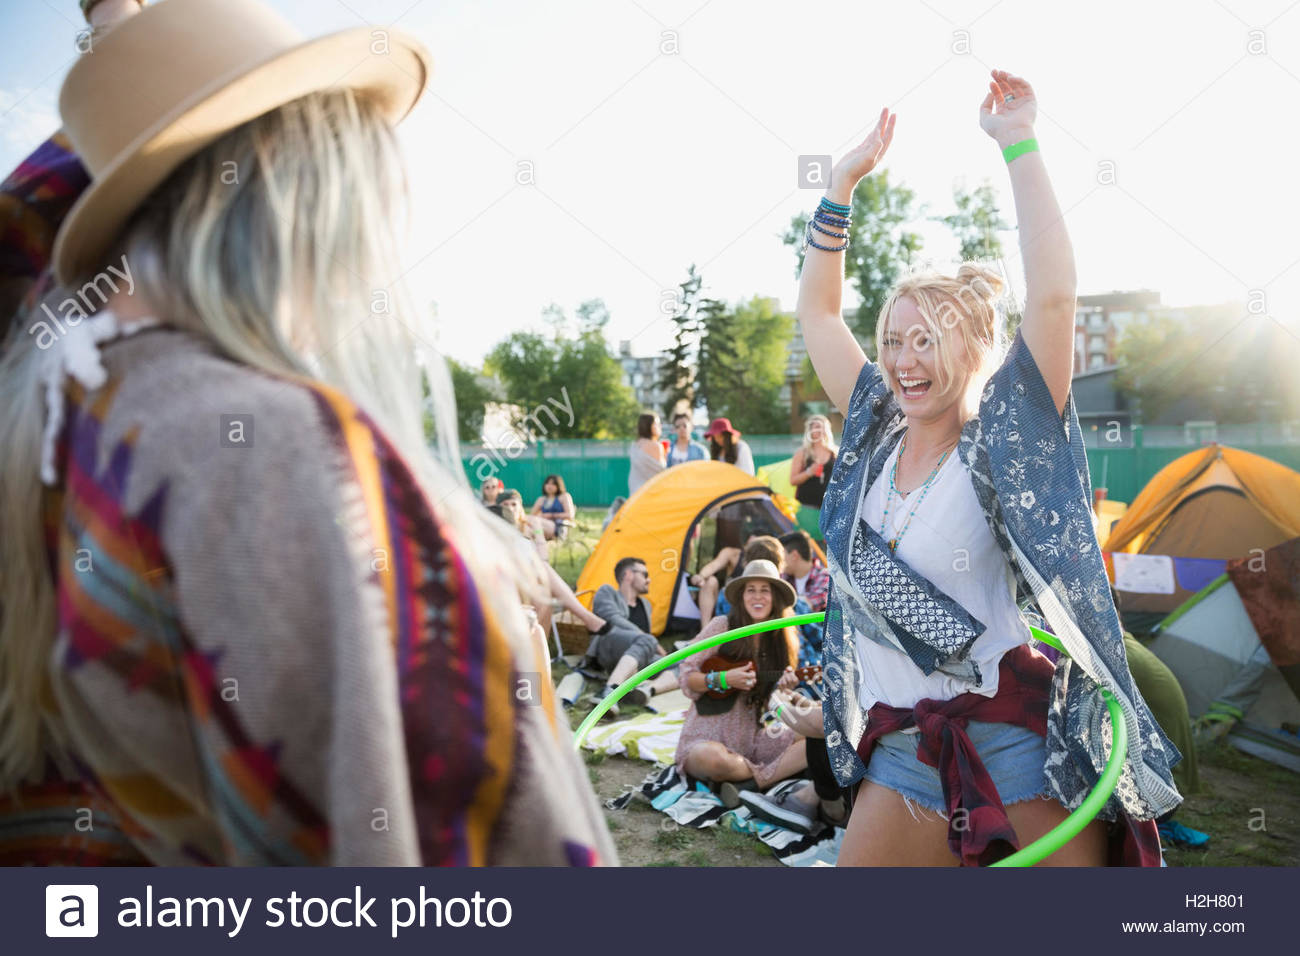 Verspielte junge Frau spinning mit Kunststoff Hoop auf Sommer Musik Festival-Campingplatz Stockbild